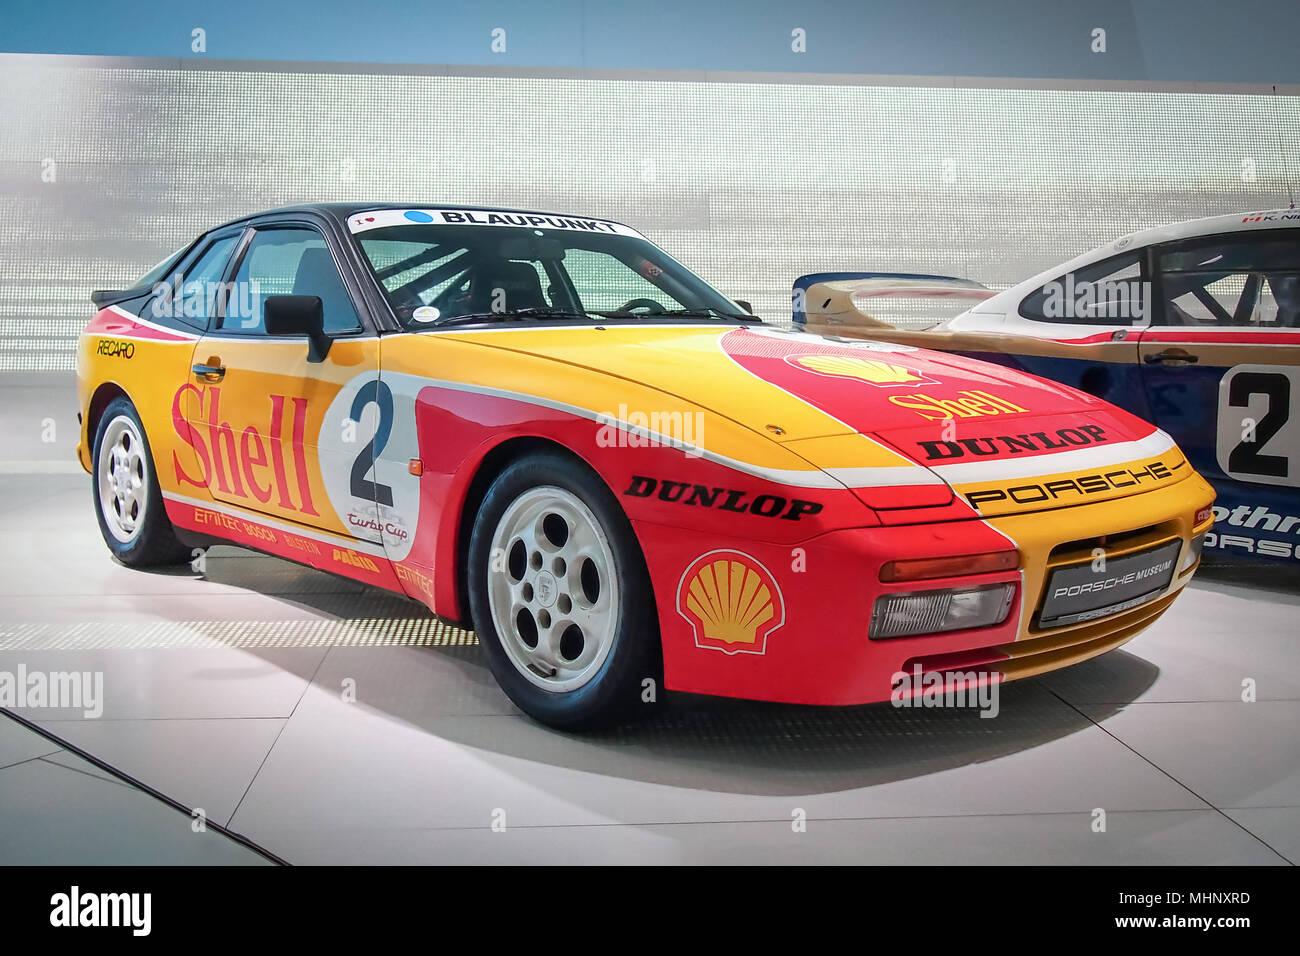 Stuttgart Germany April 7 2017 1988 Porsche 944 Turbo Cup In The Porsche Museum Stock Photo Alamy